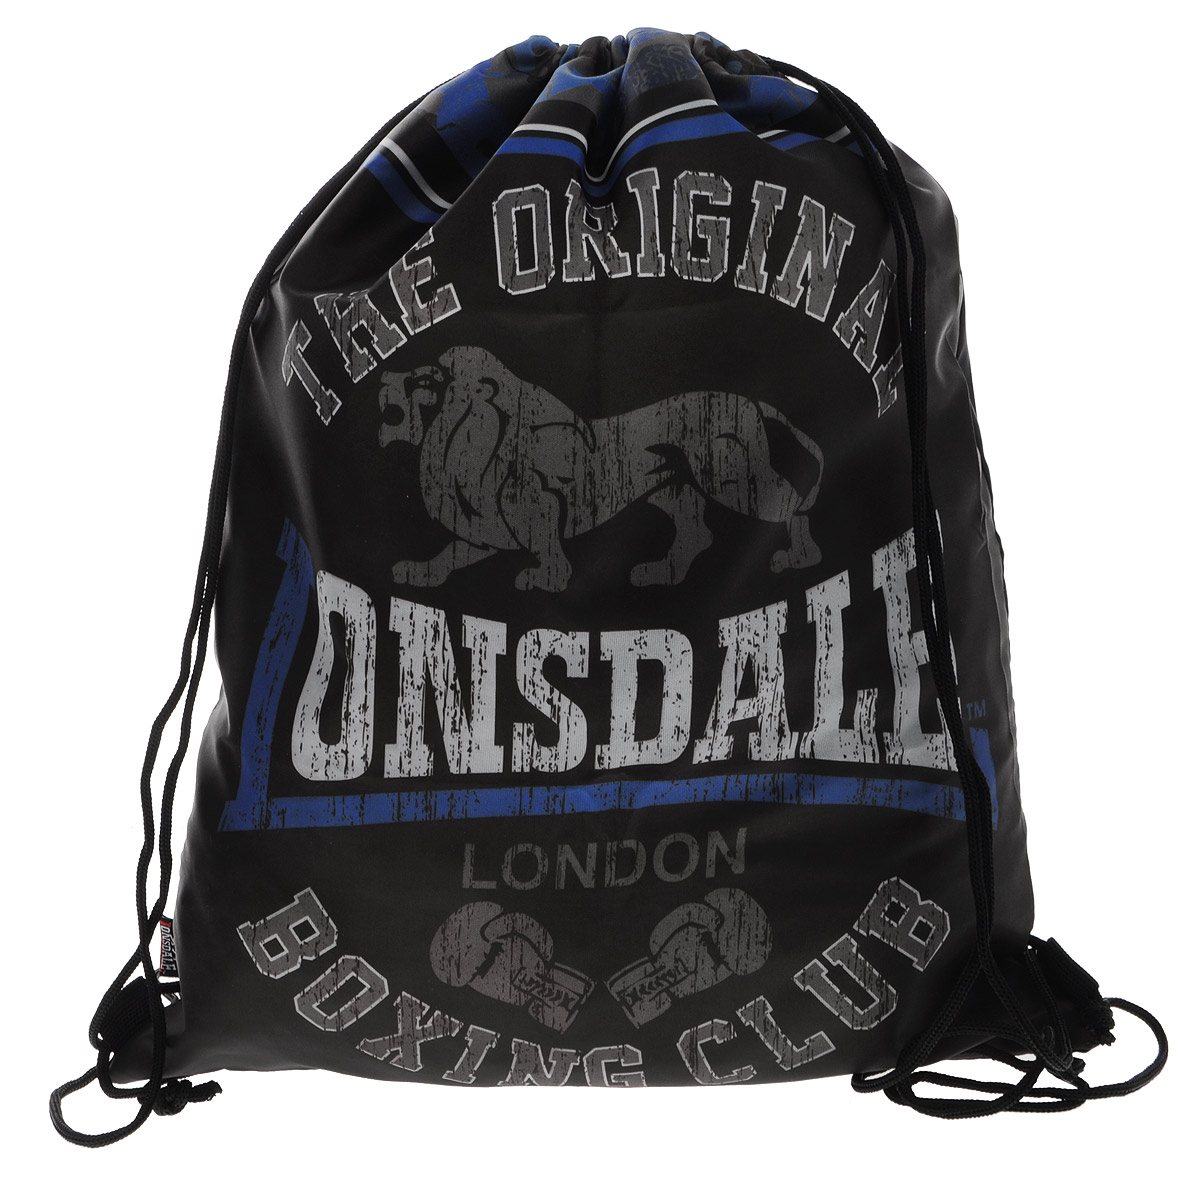 Lonsdale Сумка-рюкзак для обуви цвет черно-голубой LSCB-UT1-883 мешок для обуви академия групп transformers 43 34см trbb ut1 883